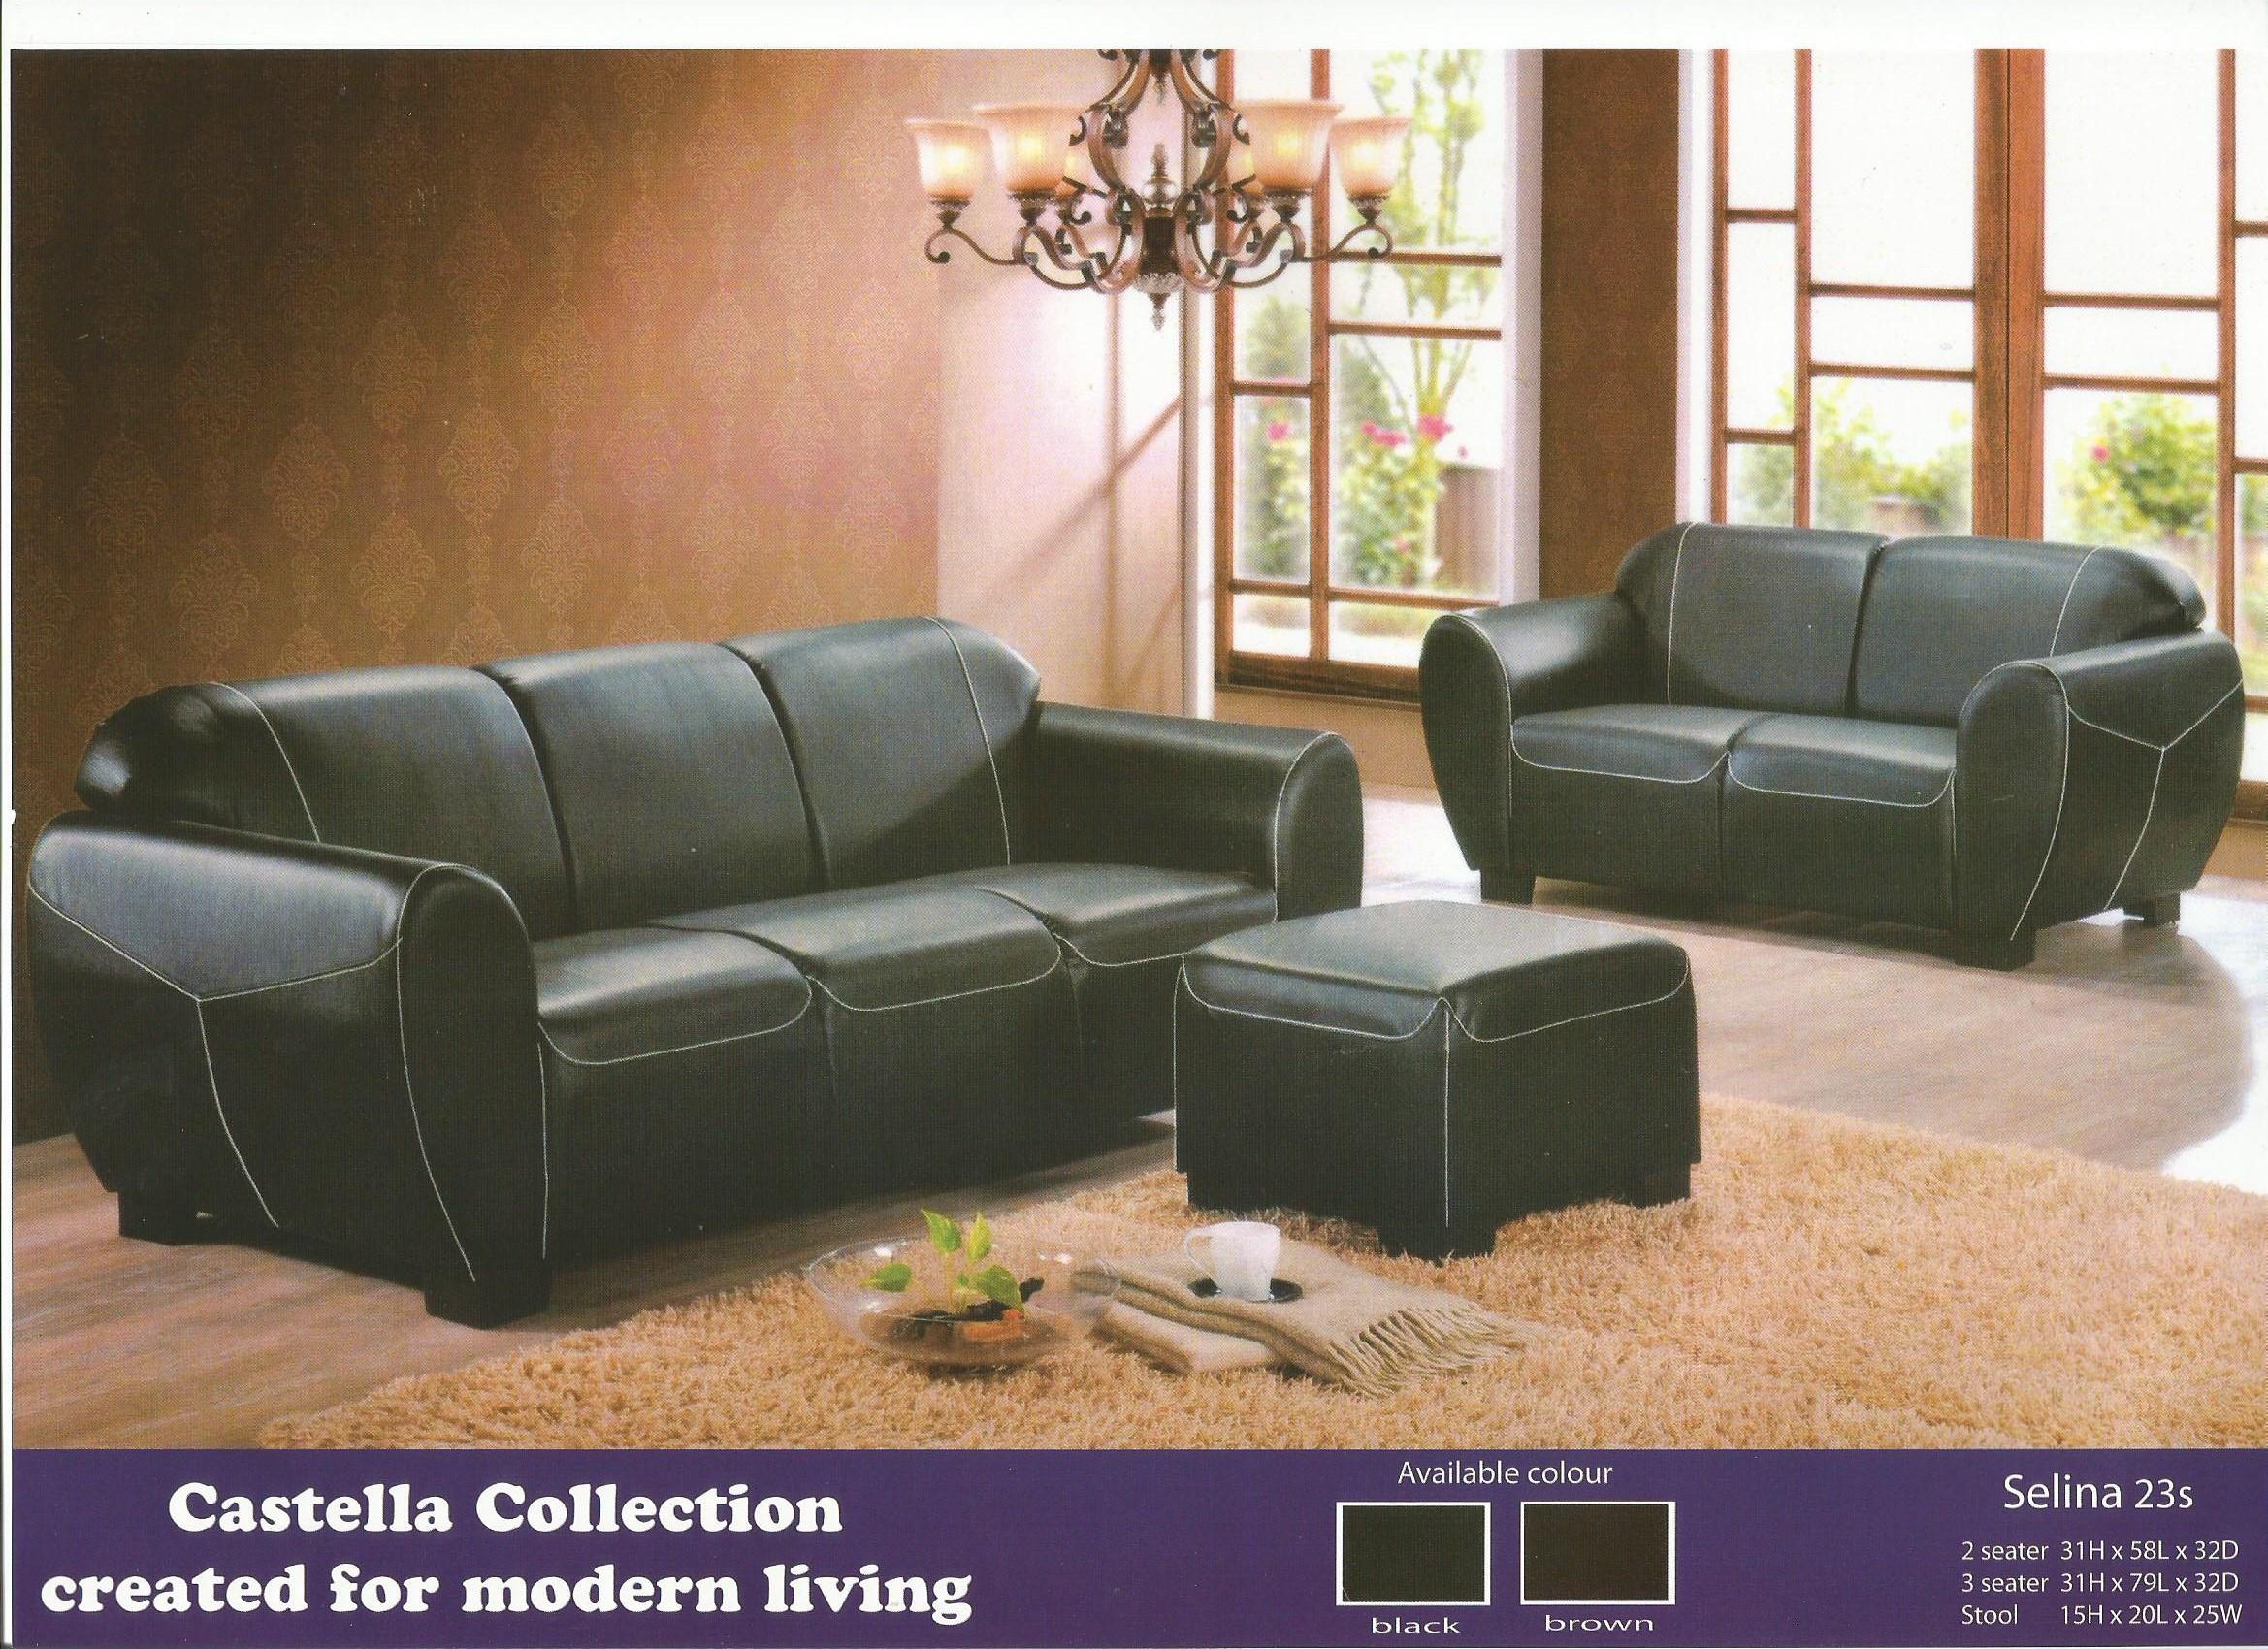 low price sofa set 2 3 stool model SELINA Home & Furniture Furniture on Carousell